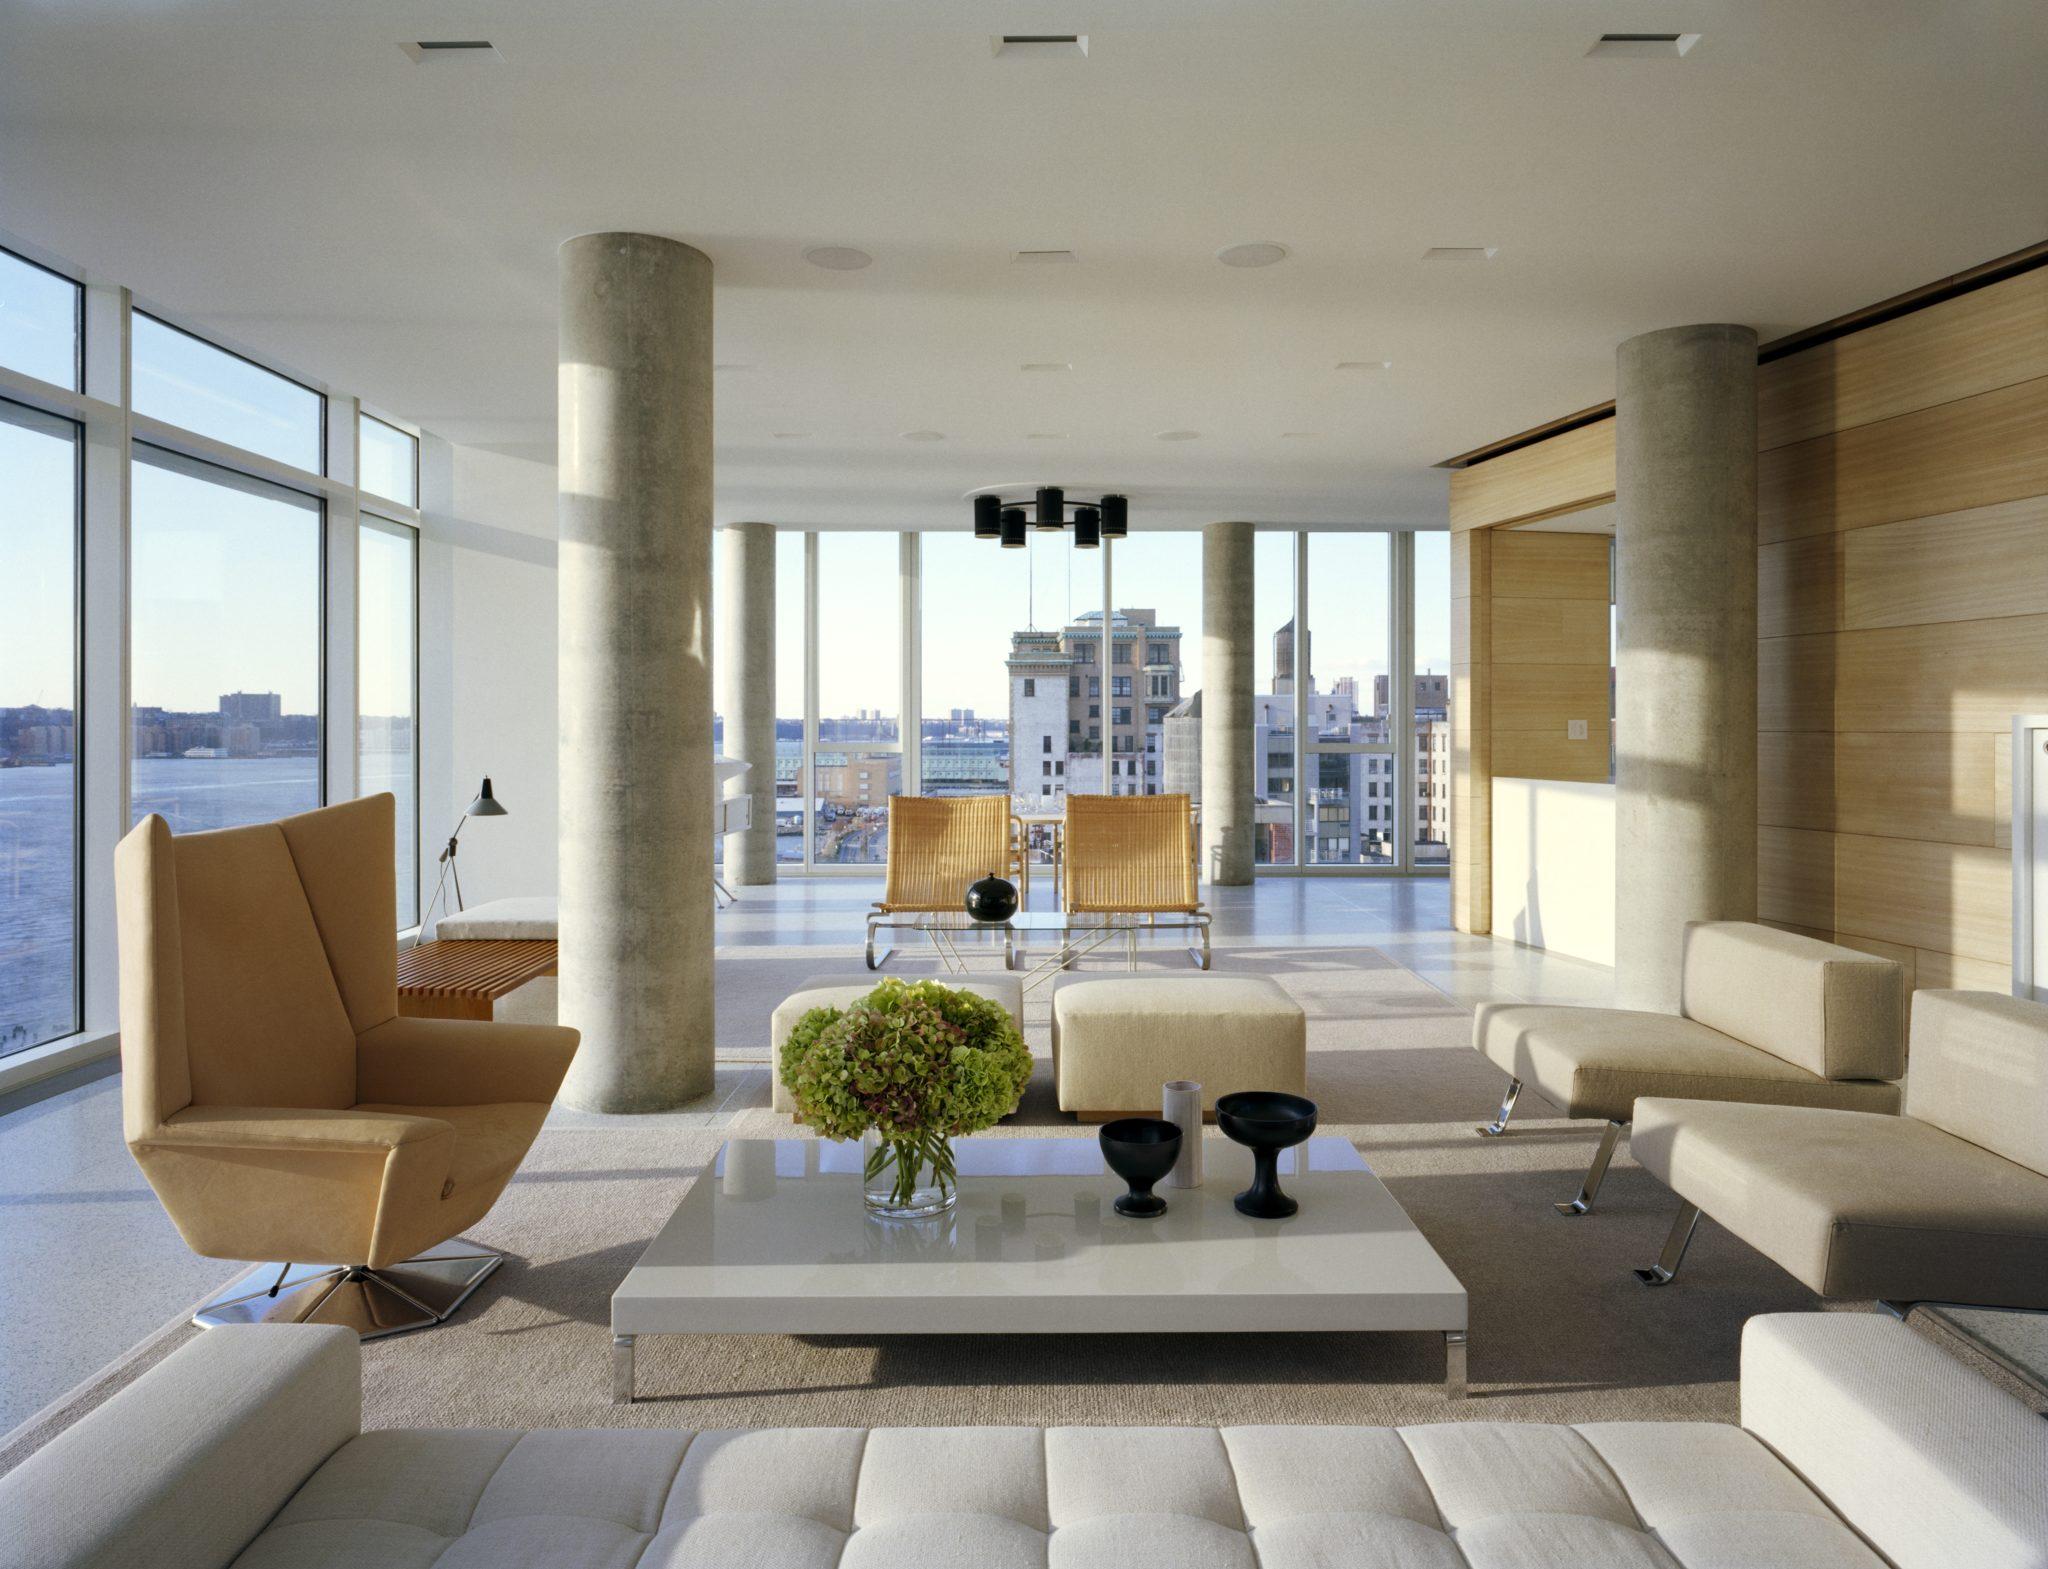 SheltonMindel Project: Hudson River Residence by SheltonMindel℠